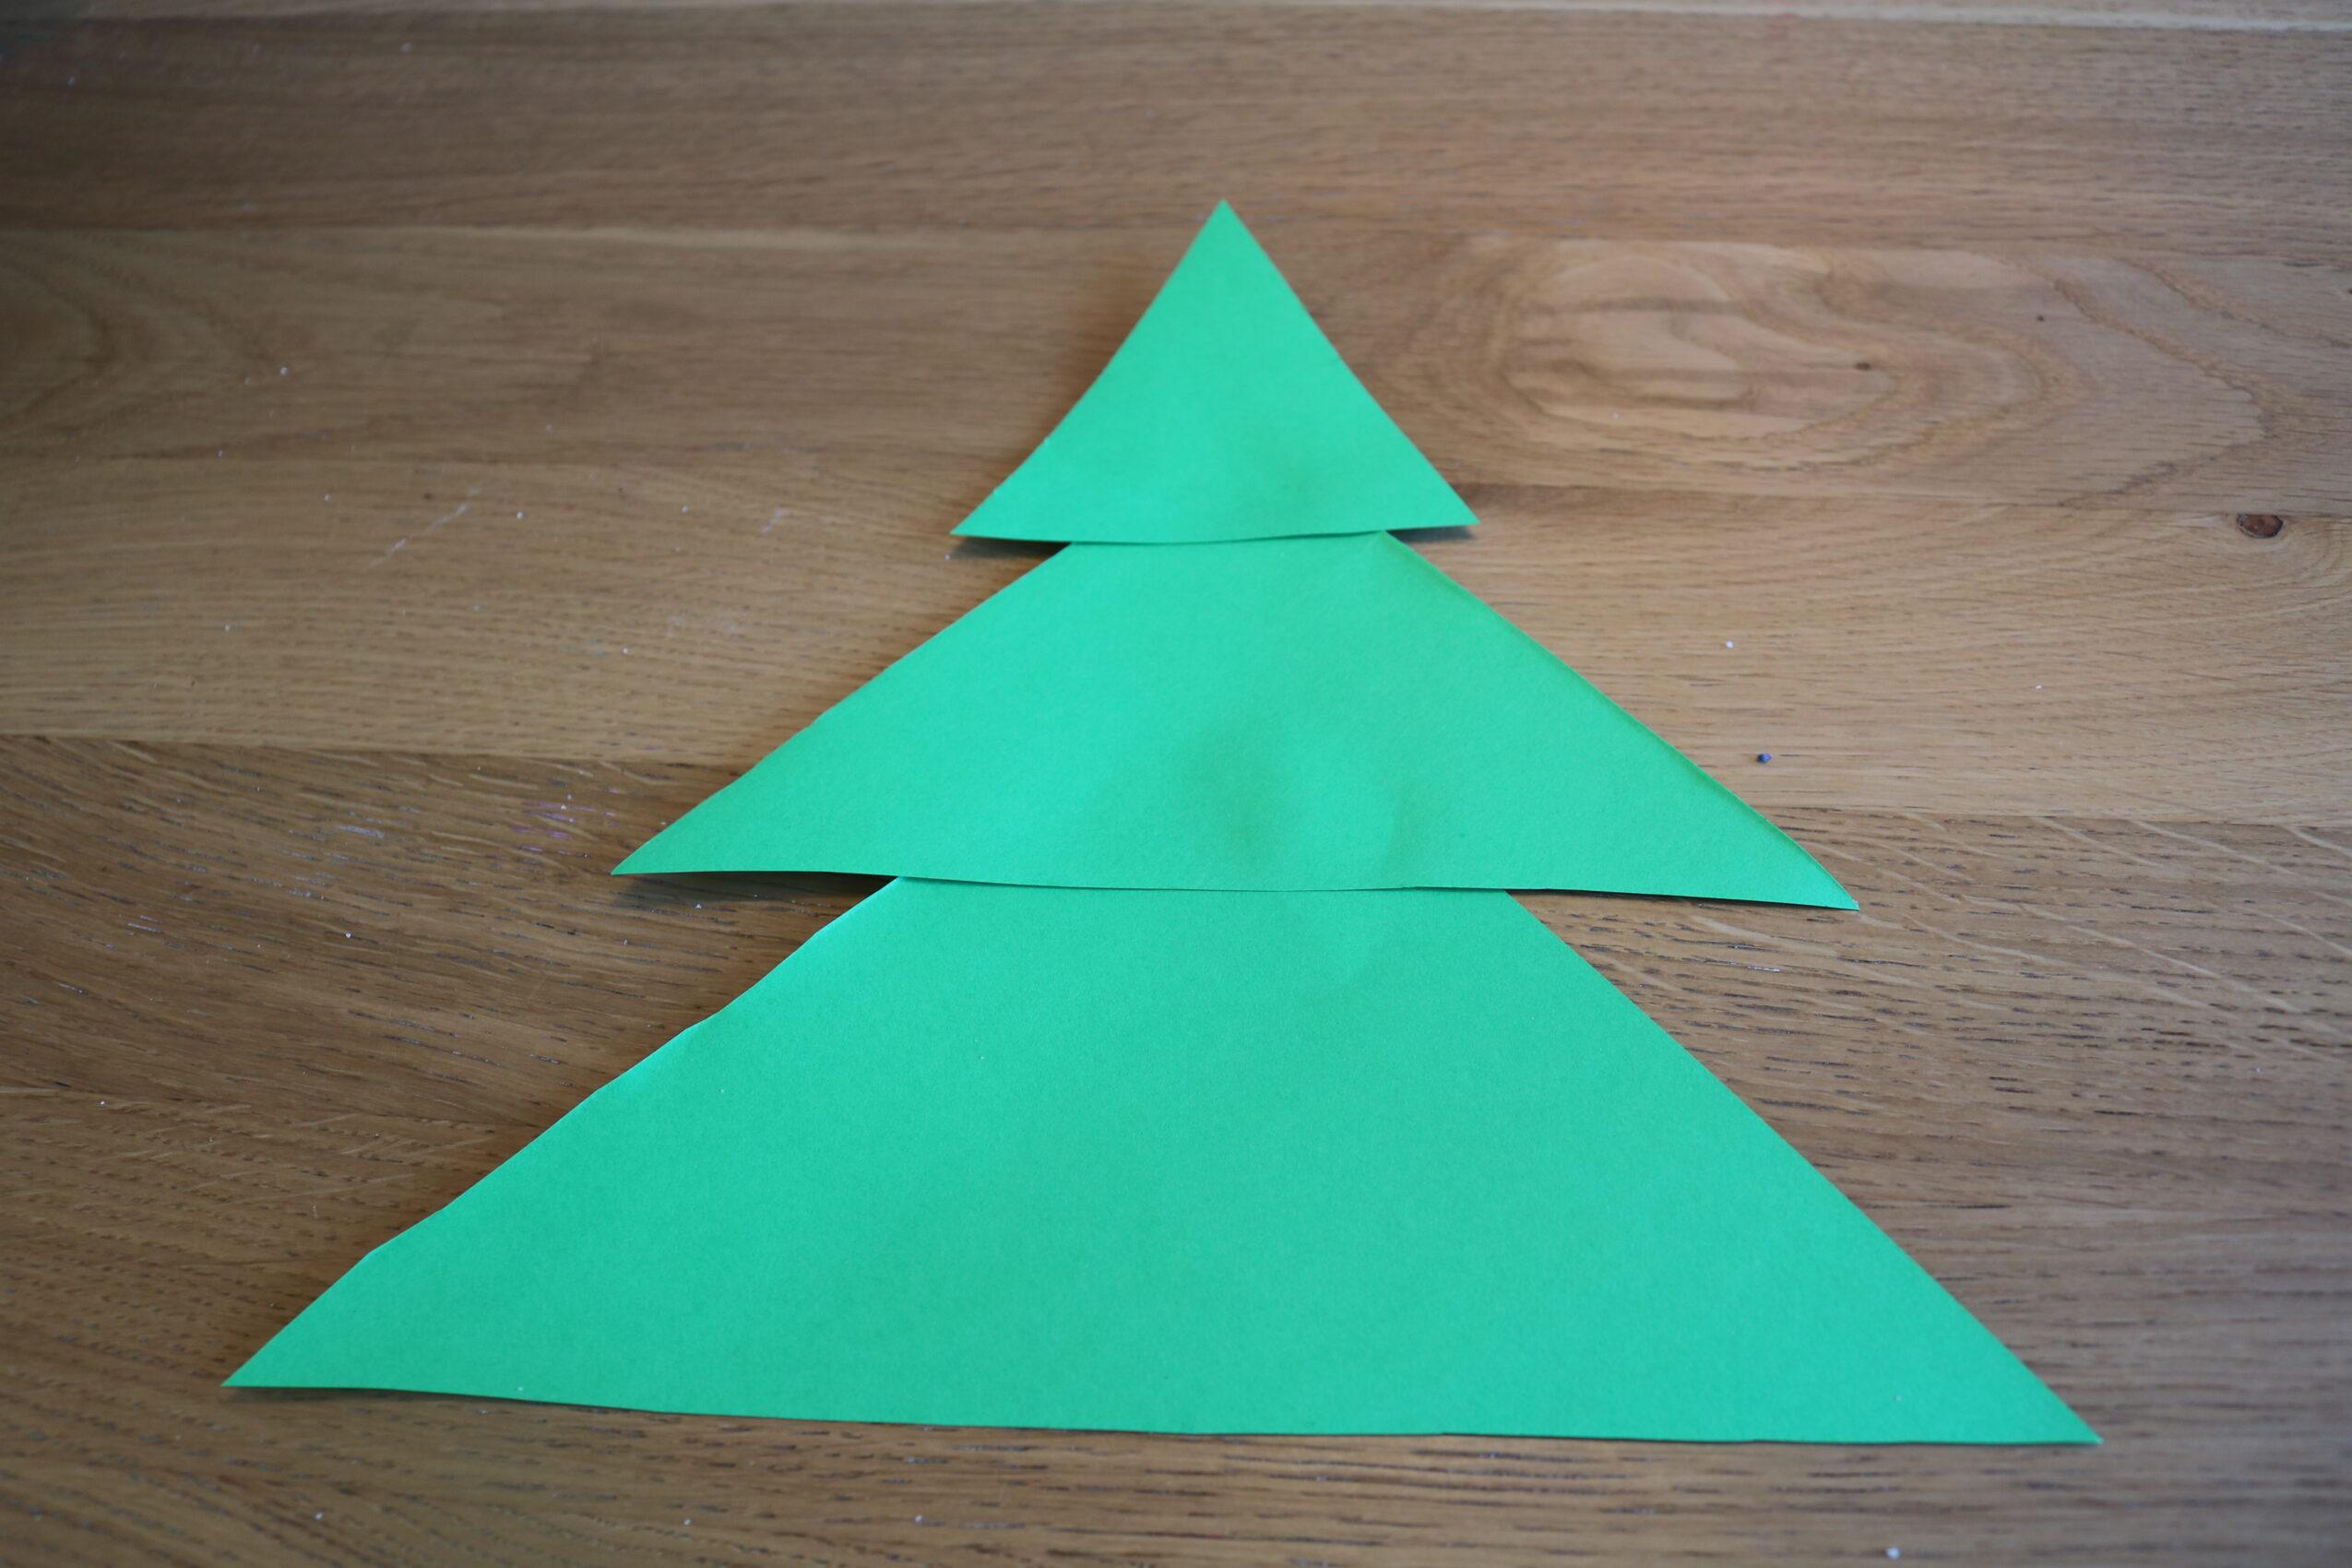 Drie driehoeken aan elkaar